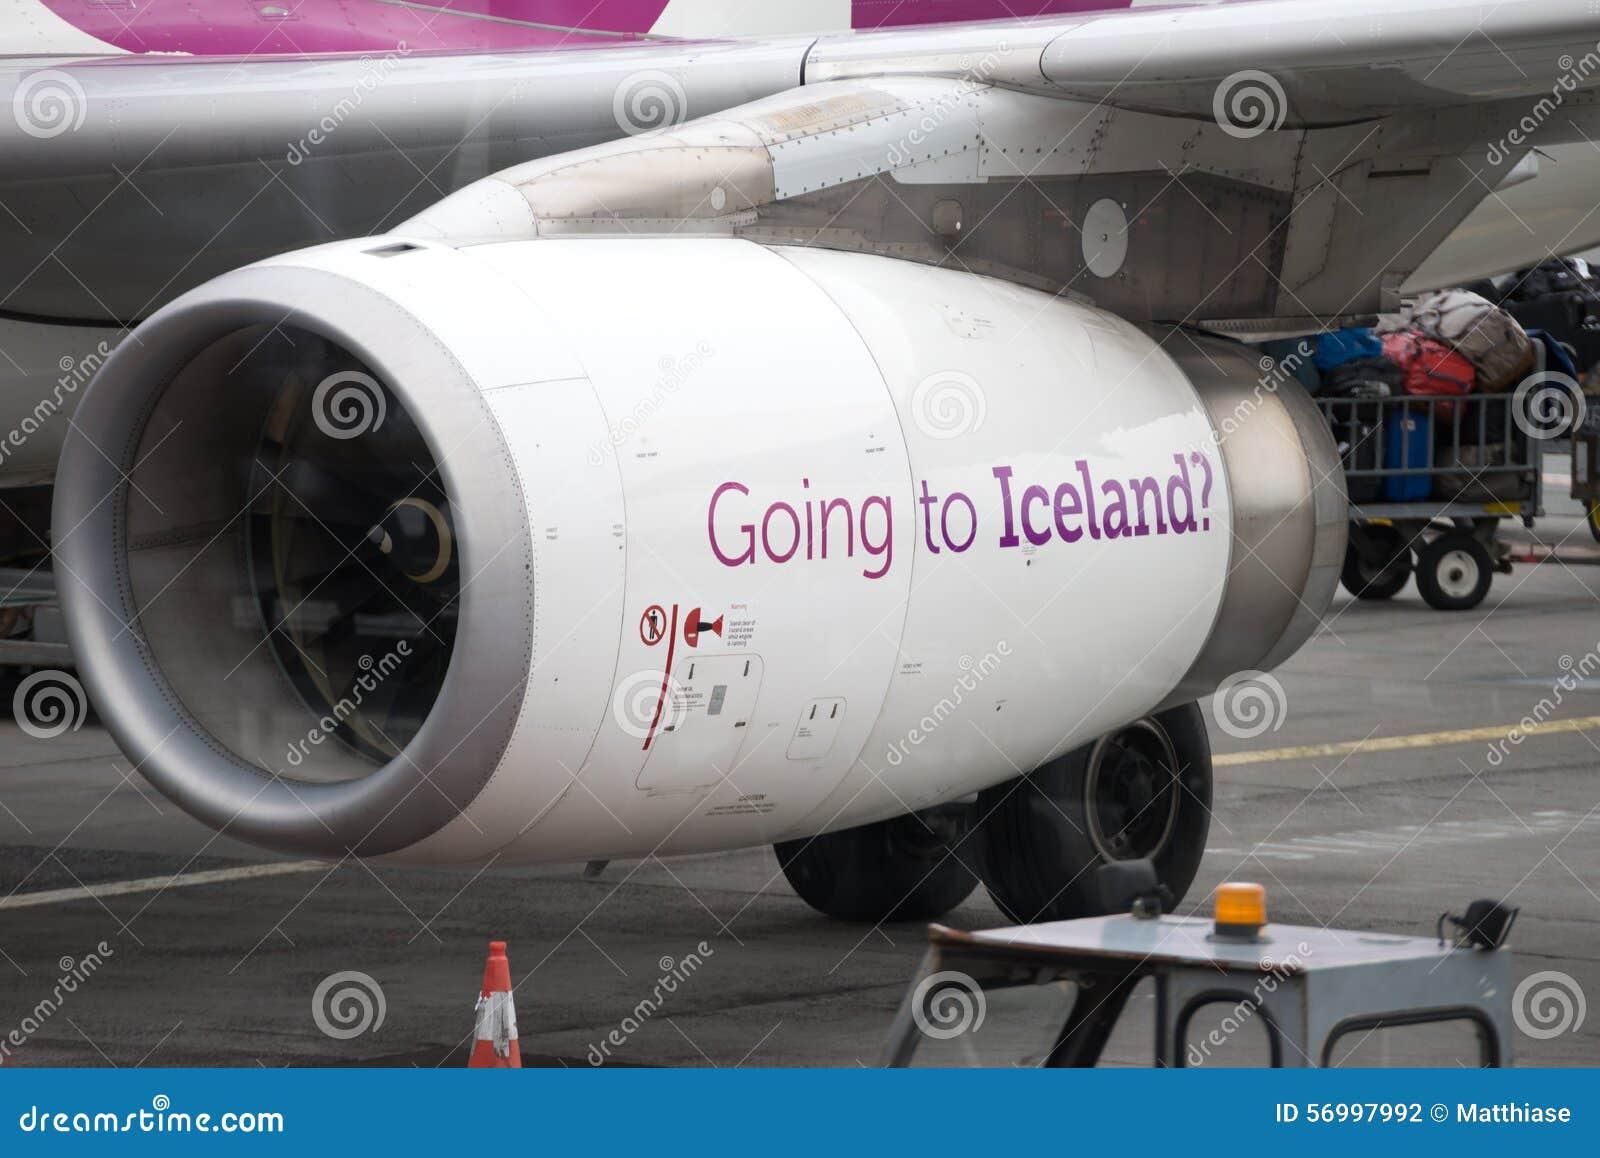 Iceland airplane engine